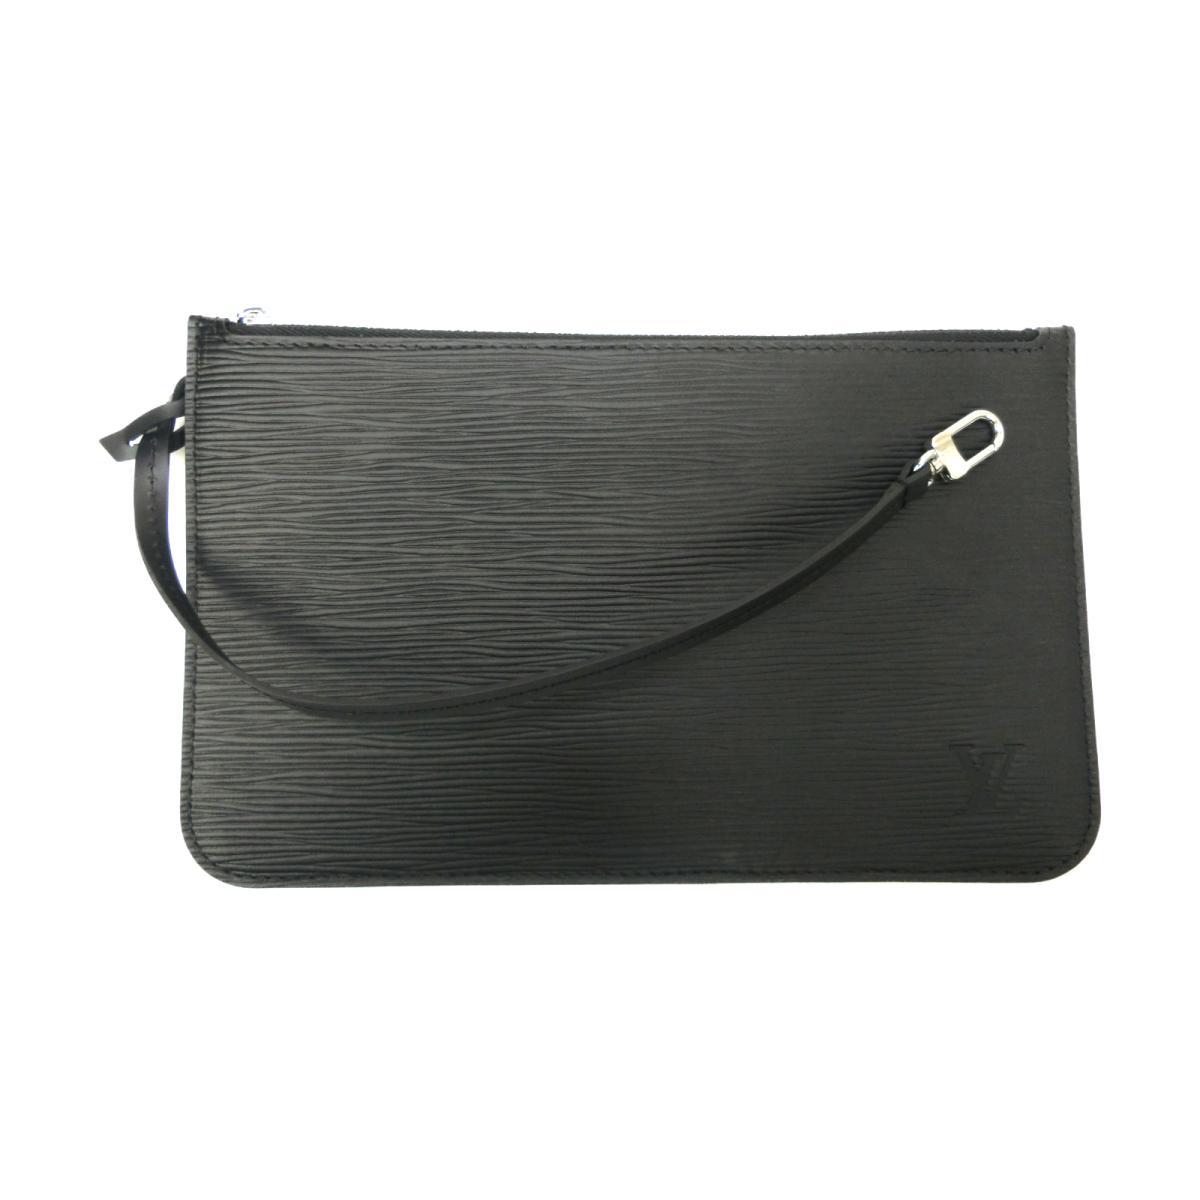 ca3c8170c BRANDOFF: Auth LOUIS VUITTON Neverfull MM Shoulder tote bag M40932 Epi  leather Noir Black NEW   BRANDOFF Ginza/TOKYO/Japan   Rakuten Global Market